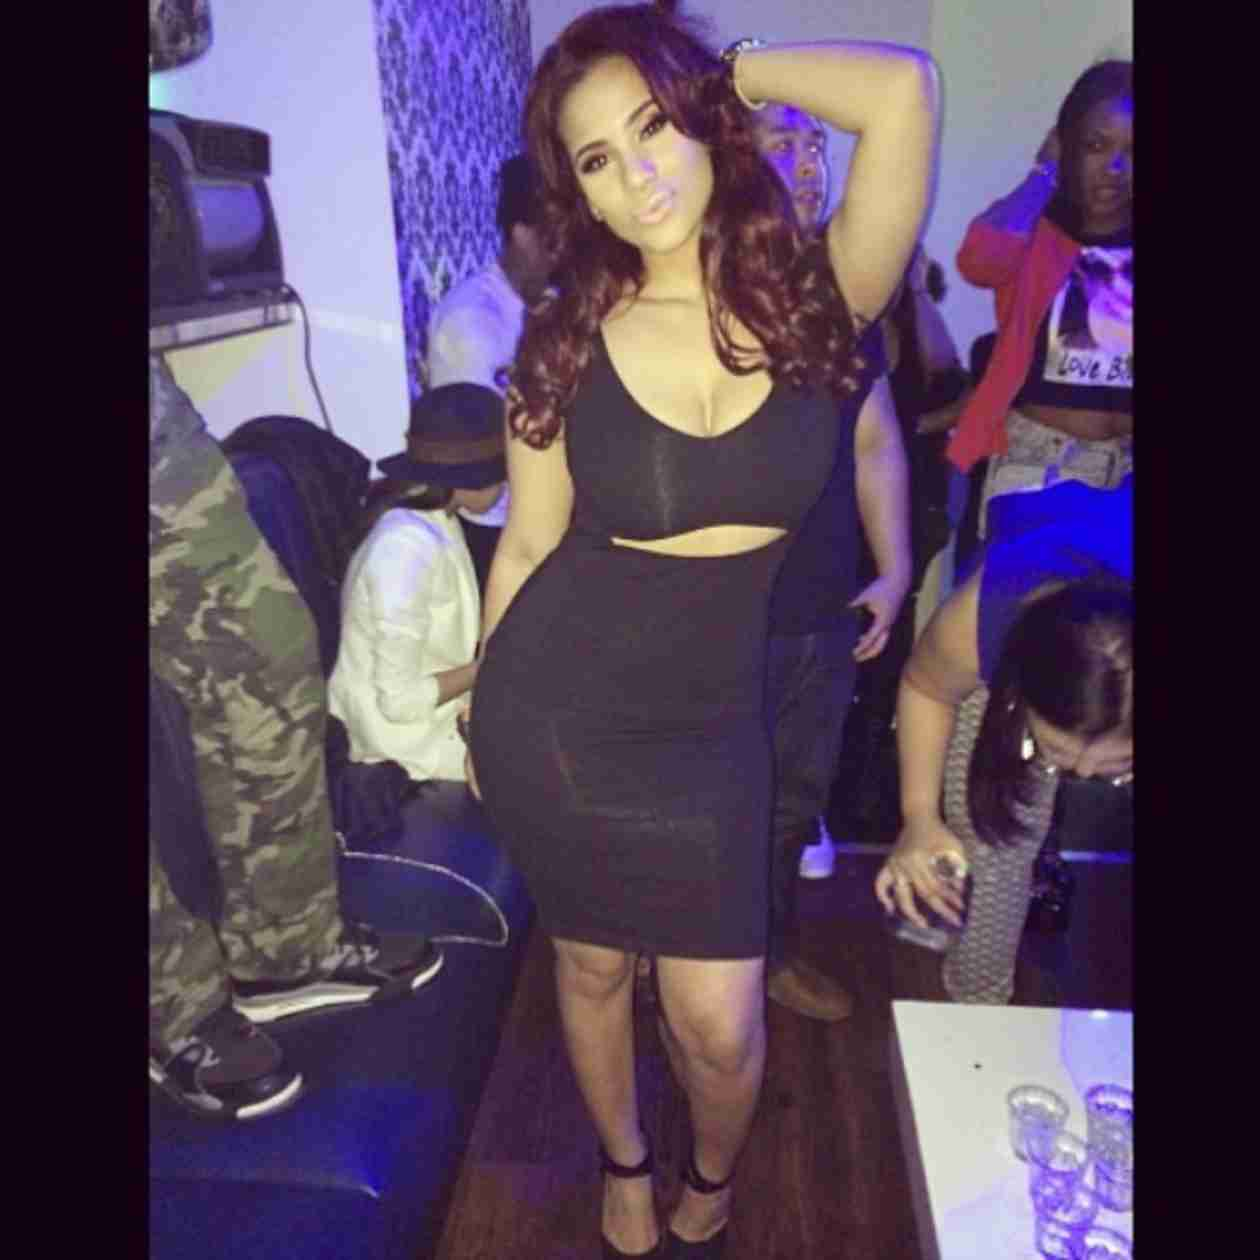 Cyn Santana Flaunts Fab Look After Breast Reduction Surgery (PHOTOS)